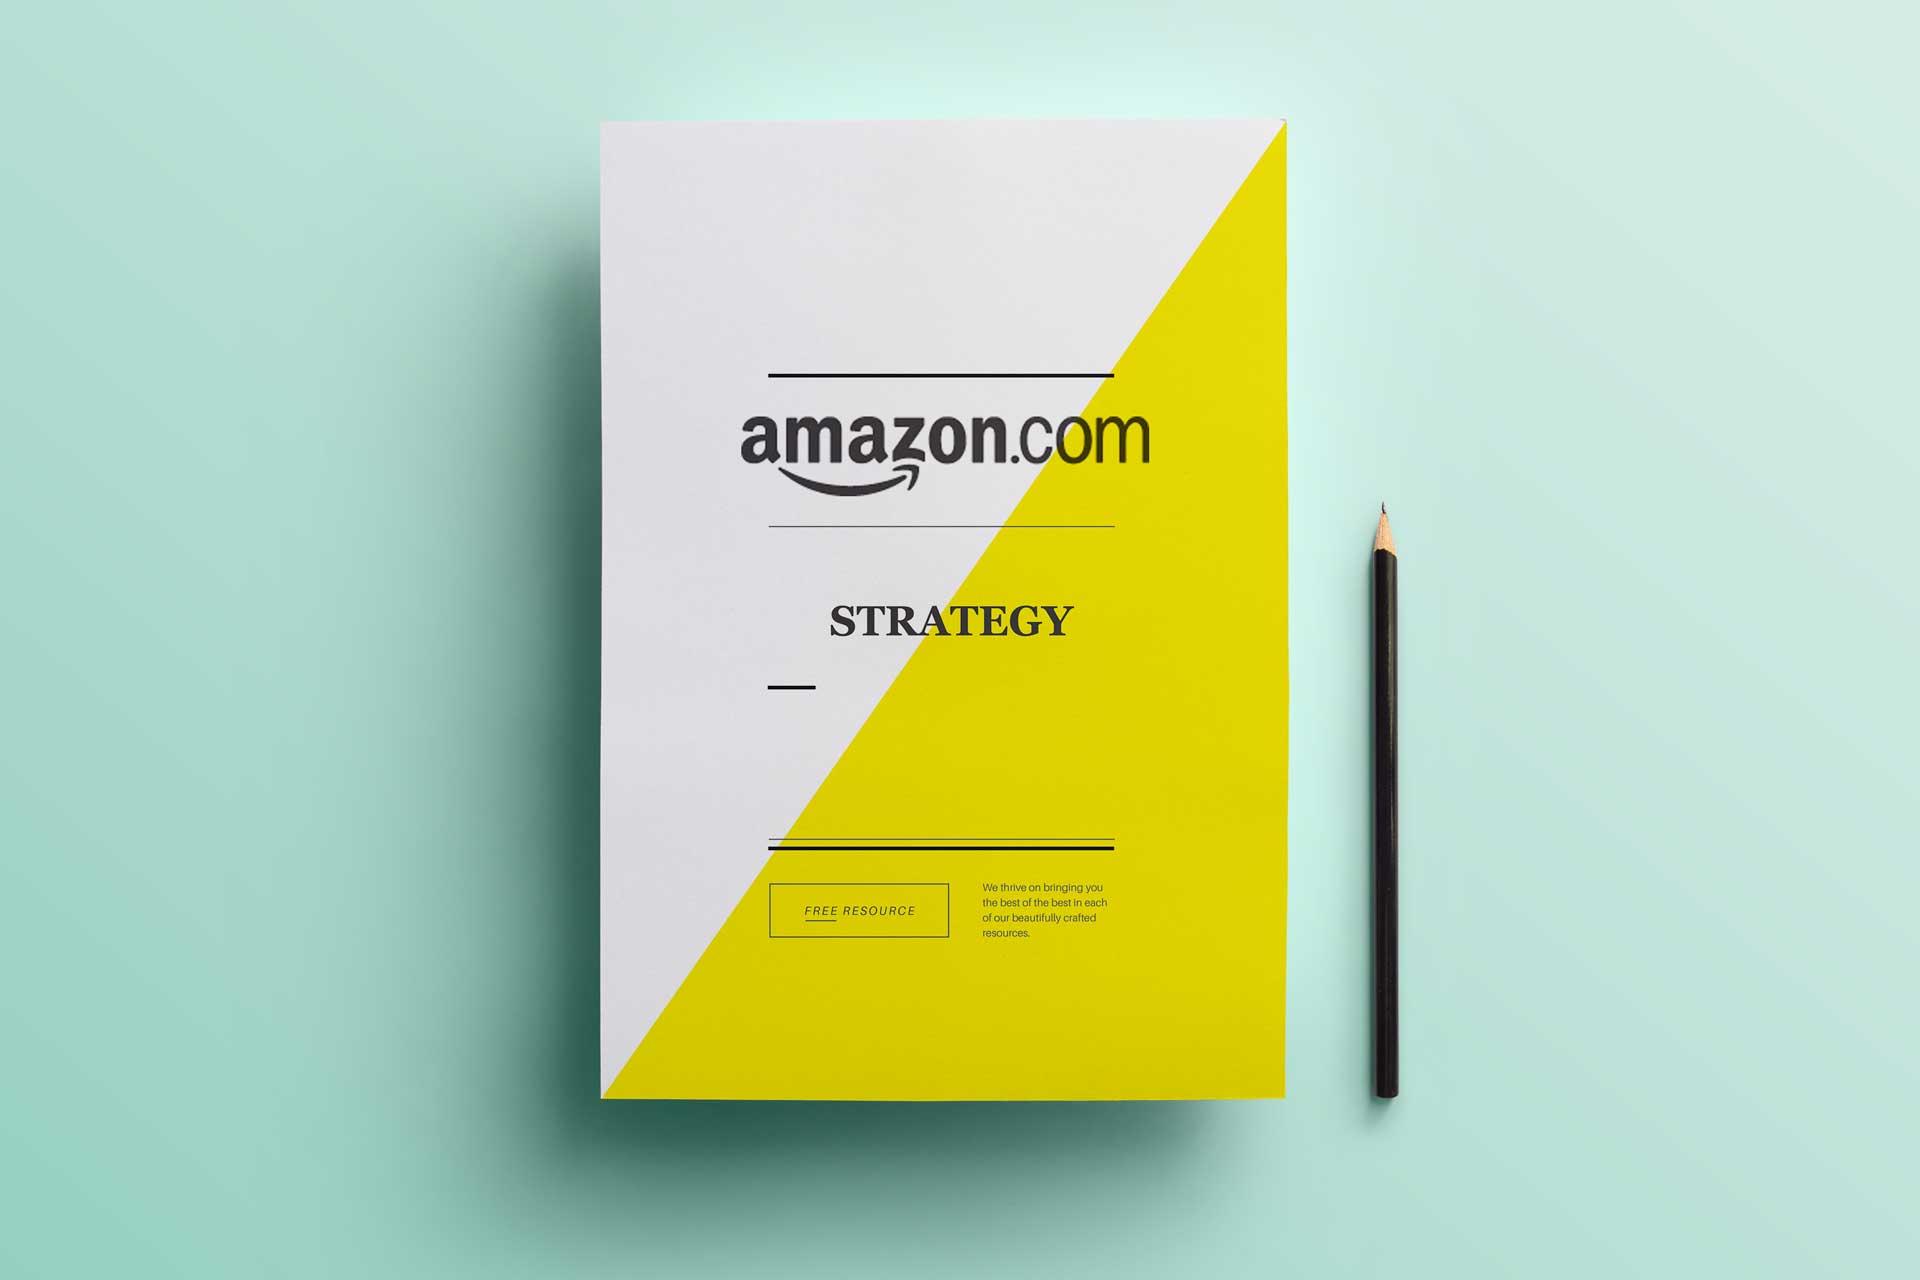 amazon_strategy02939